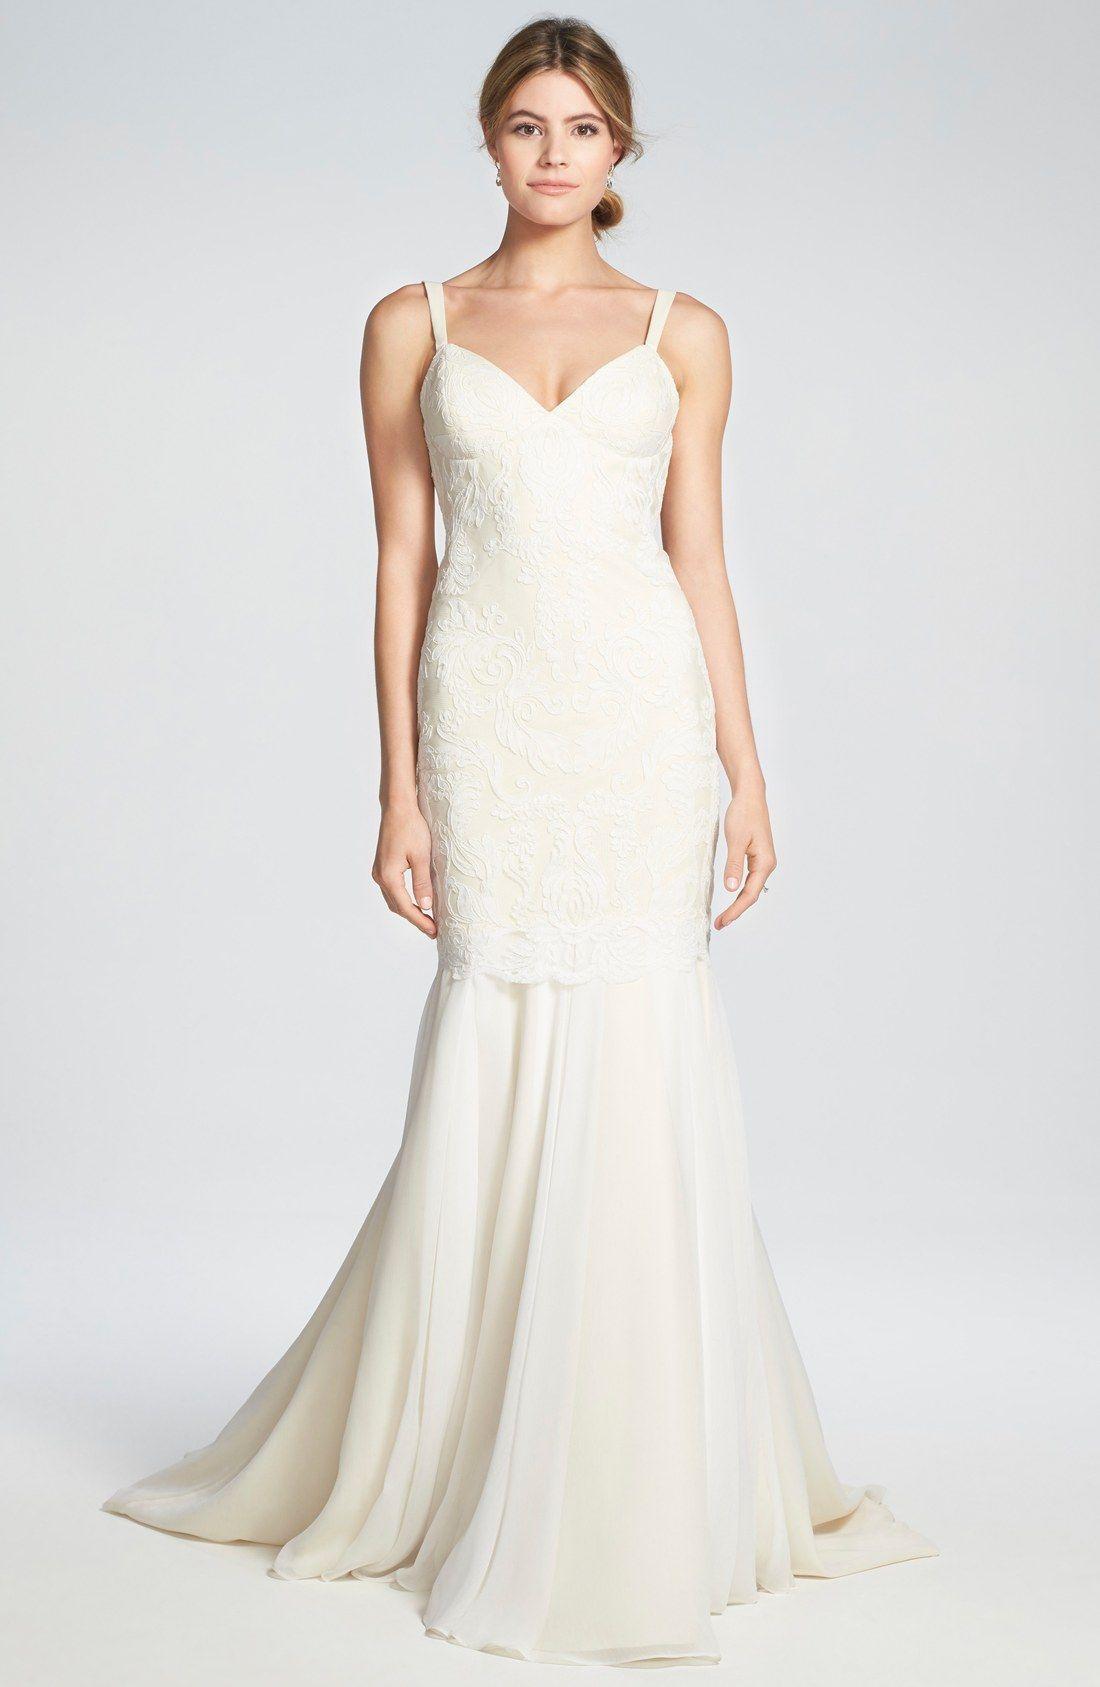 Nordstrom wedding dress  Monacou Lace u Chiffon Trumpet Gown  Lace chiffon Trumpets and Gowns